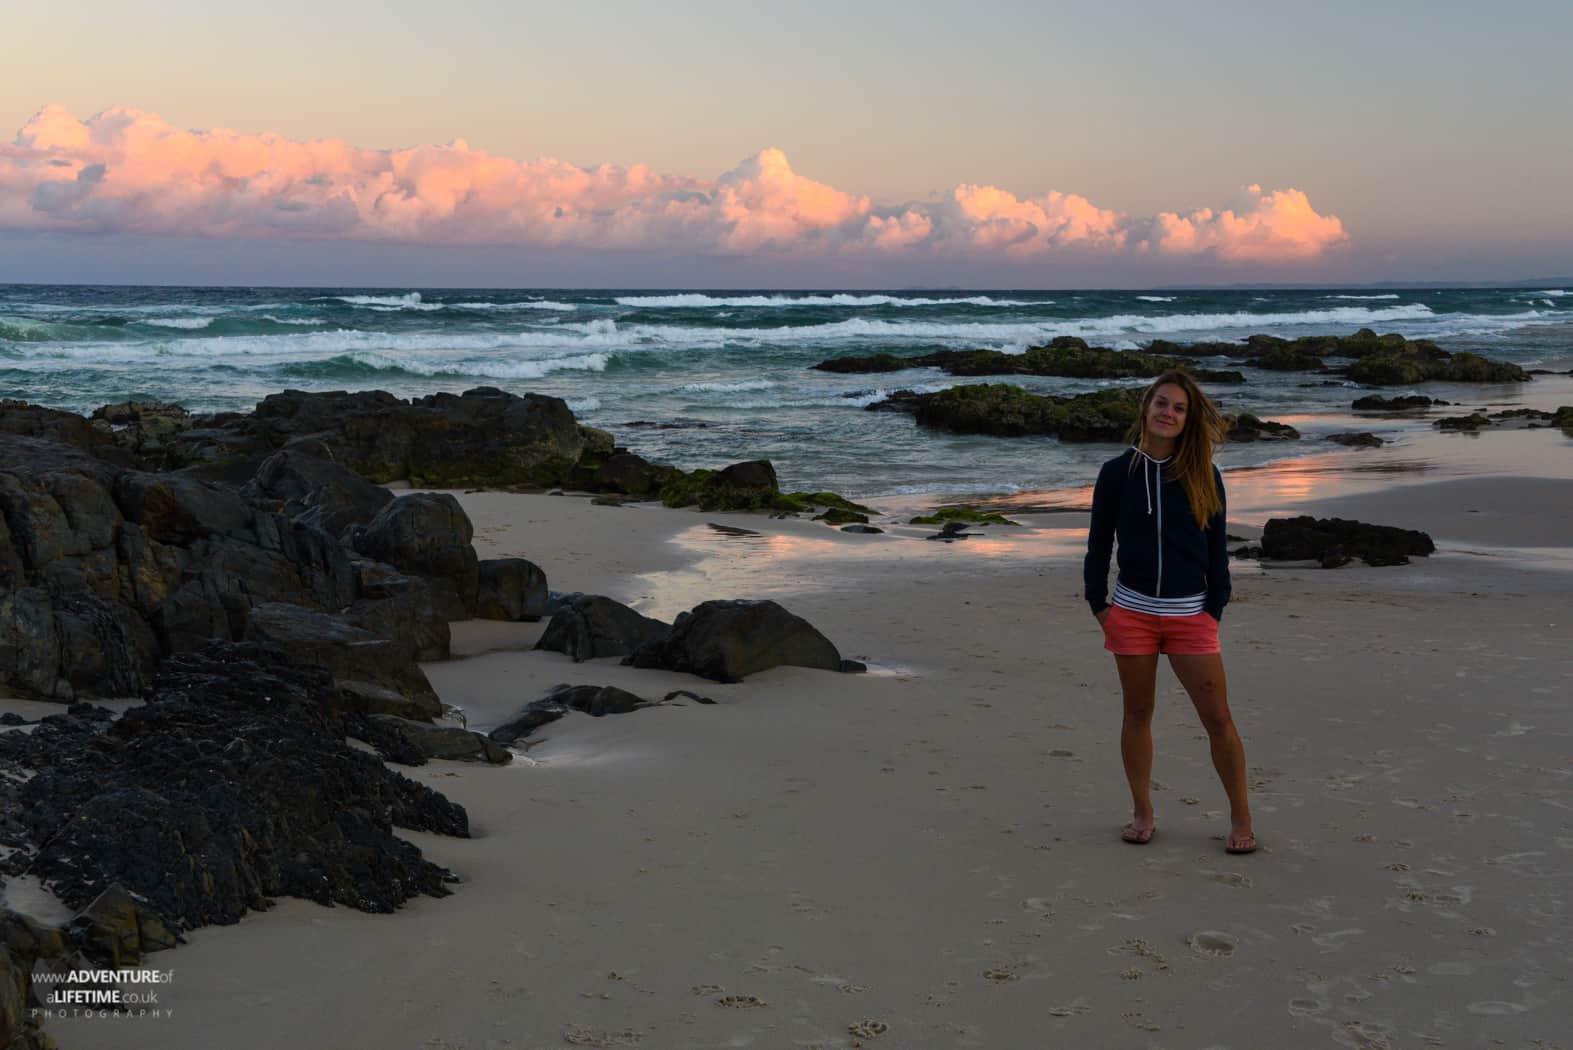 Dora at a Surfers Paradise sunset